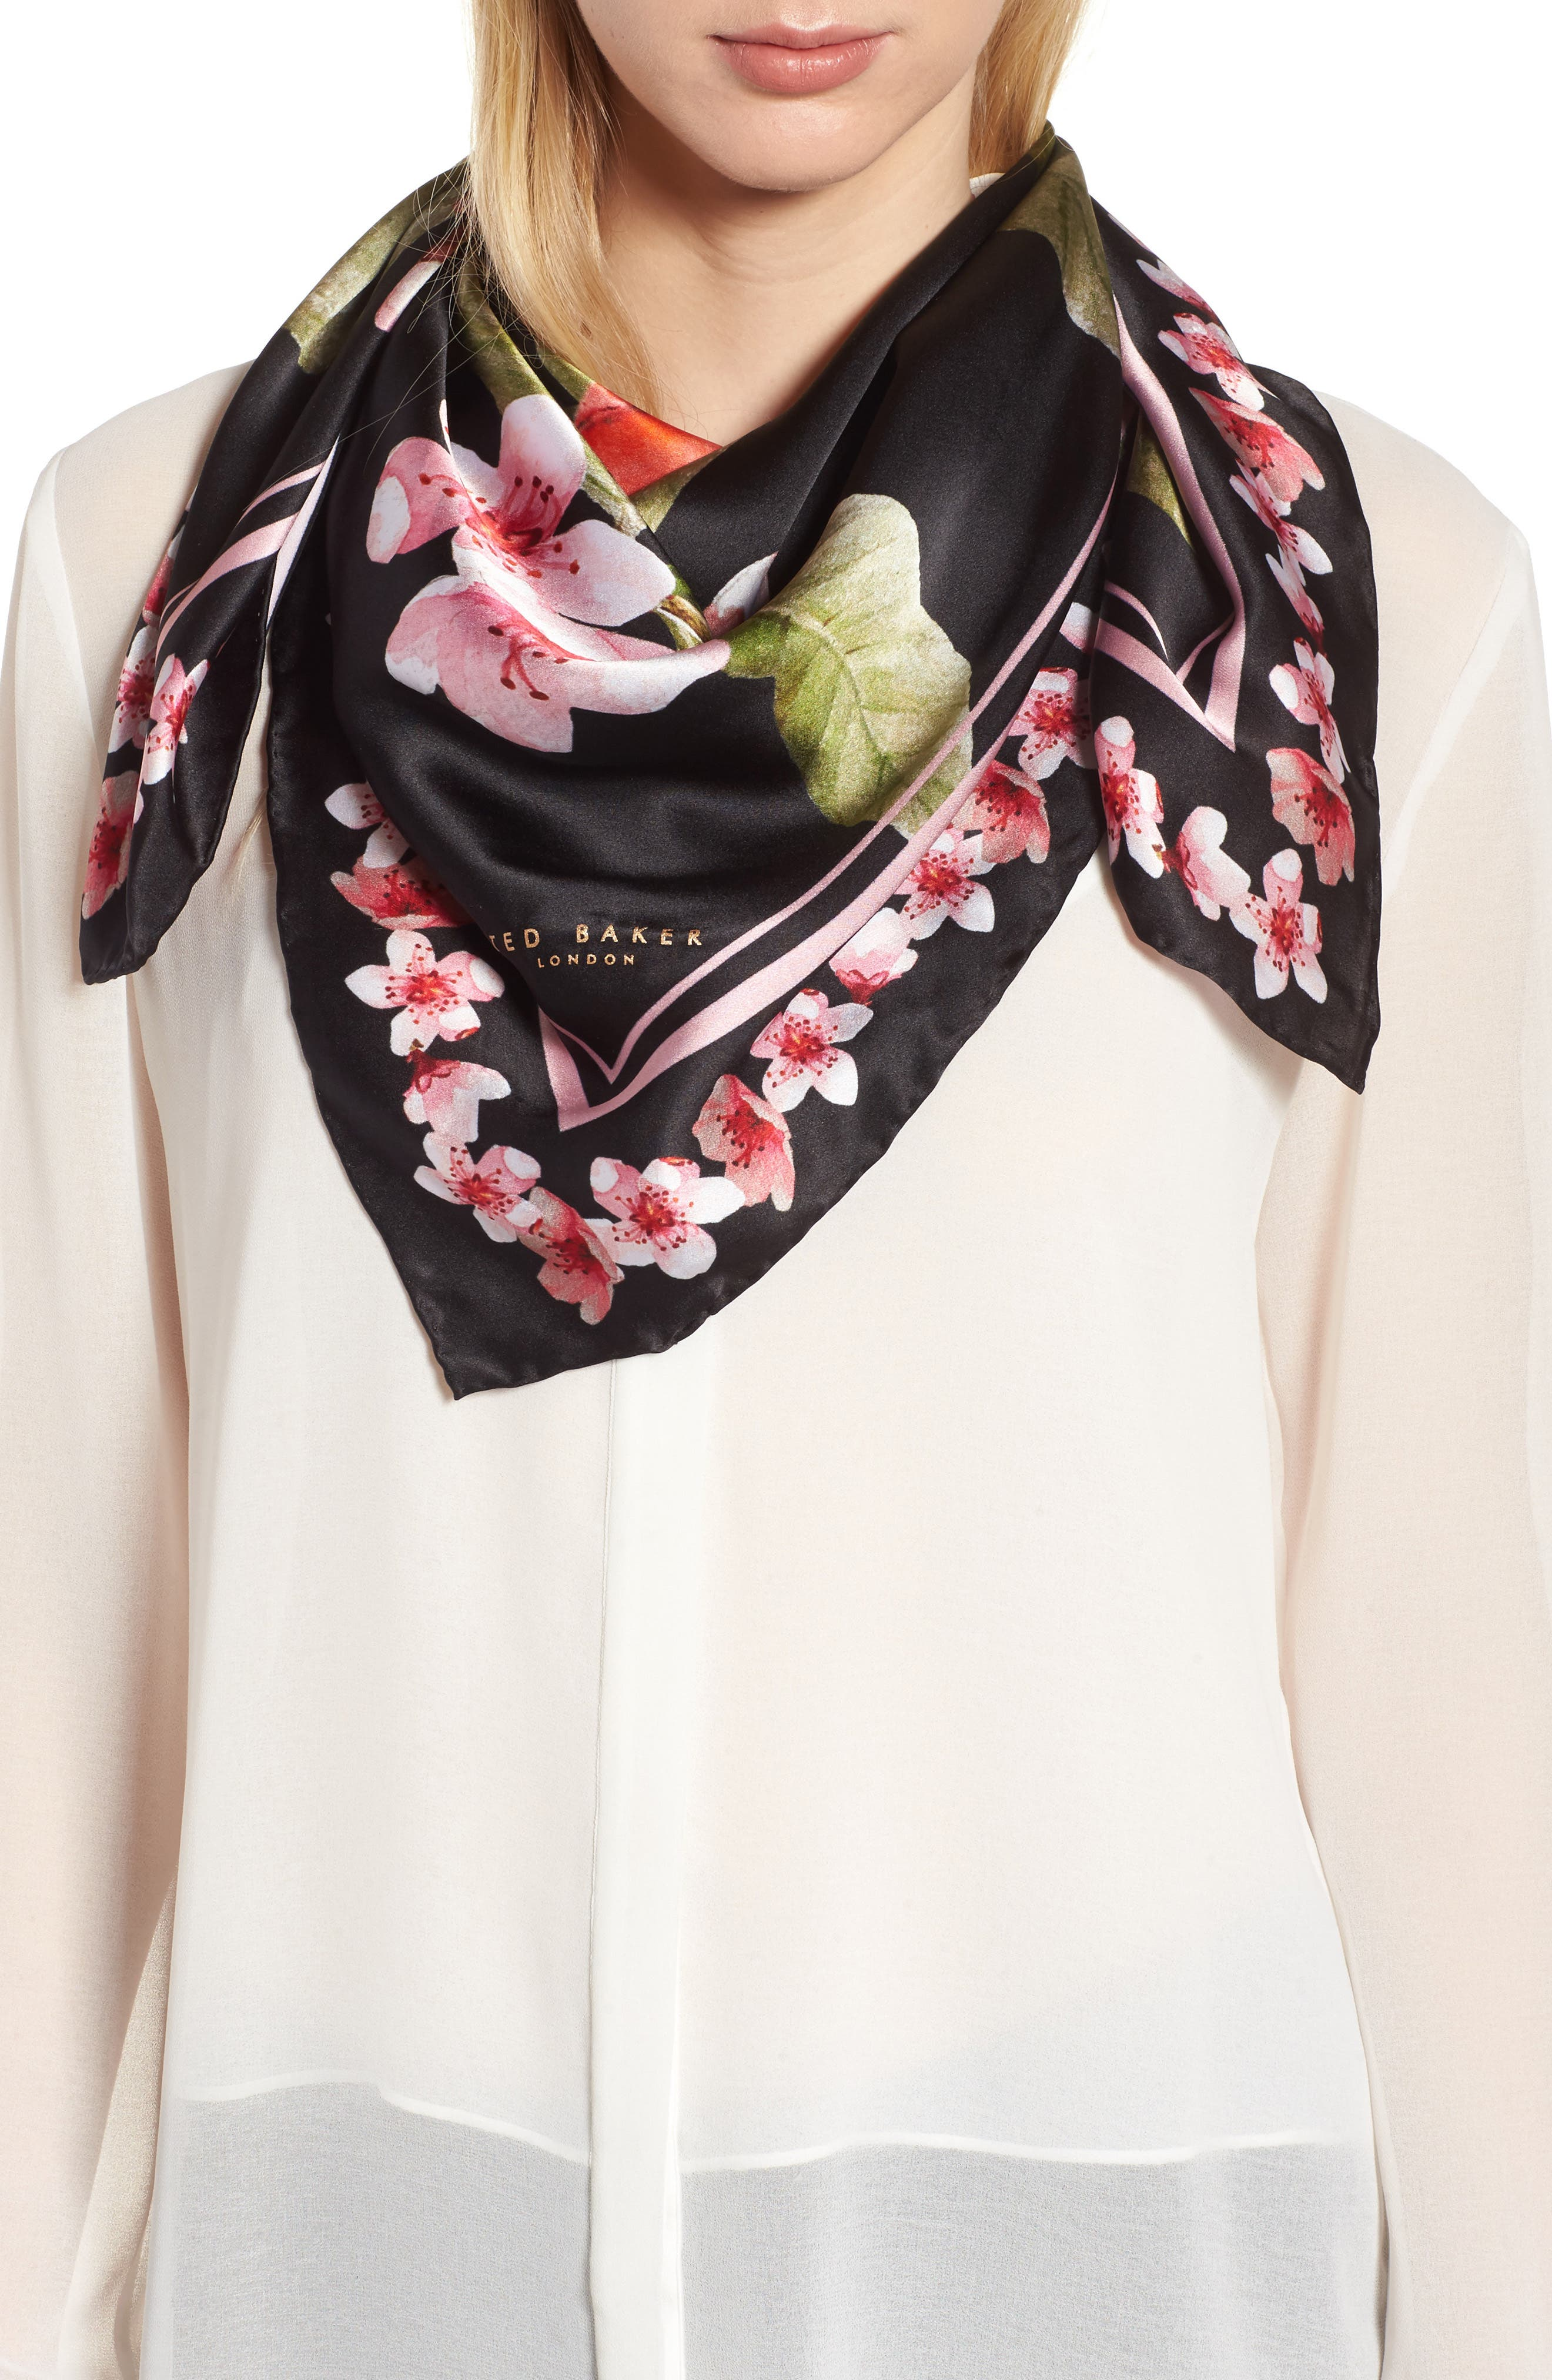 Peach Blossom Square Silk Scarf,                             Main thumbnail 1, color,                             00-Black